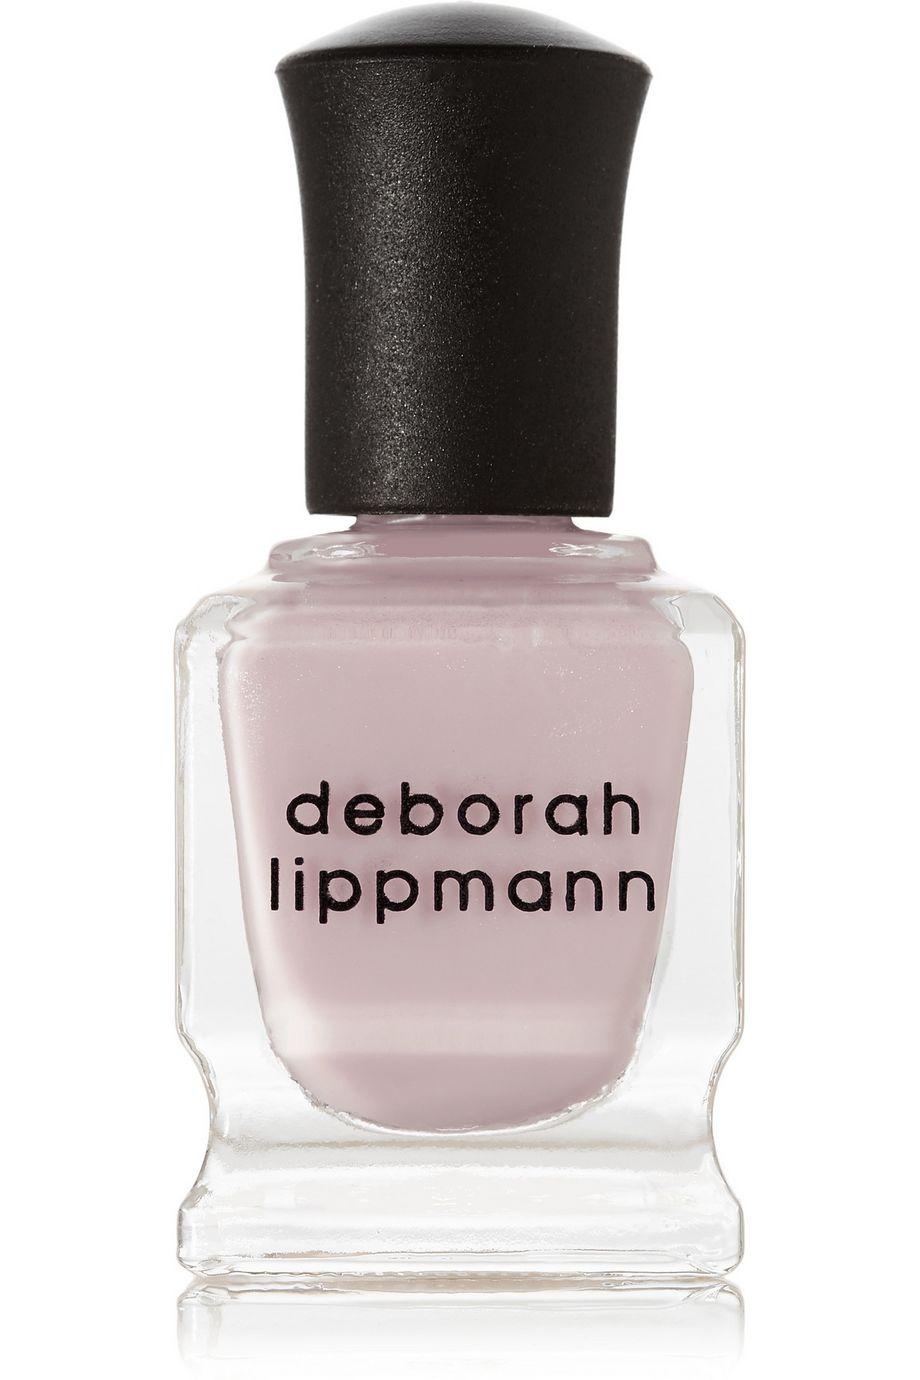 Deborah Lippmann Nail Polish – Like Dreamers Do – Nagellack